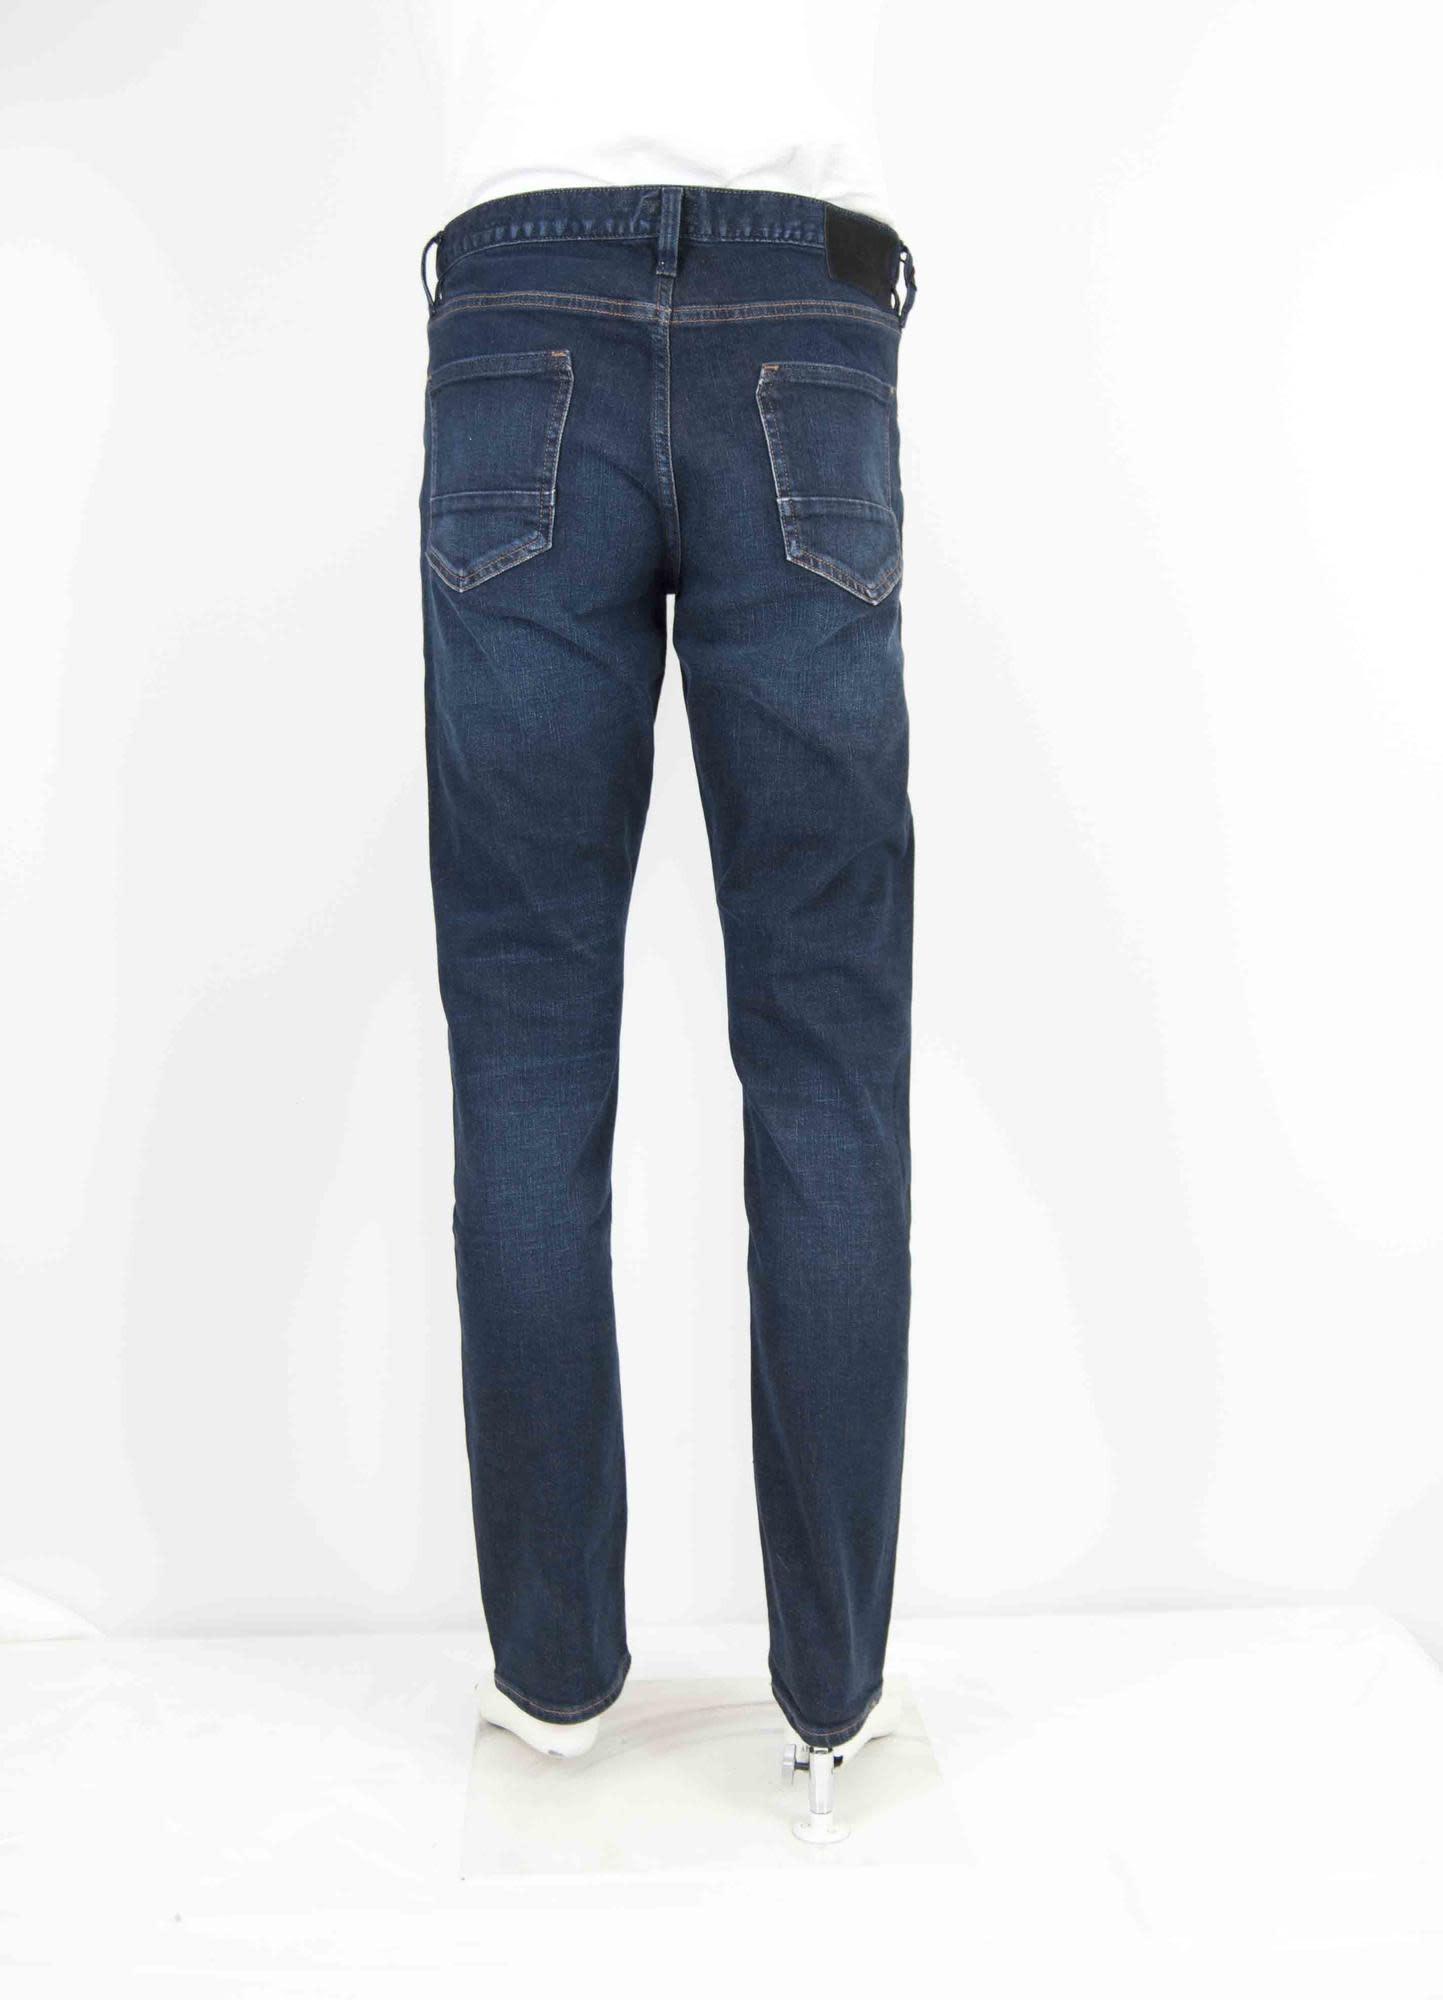 Machray Jeans